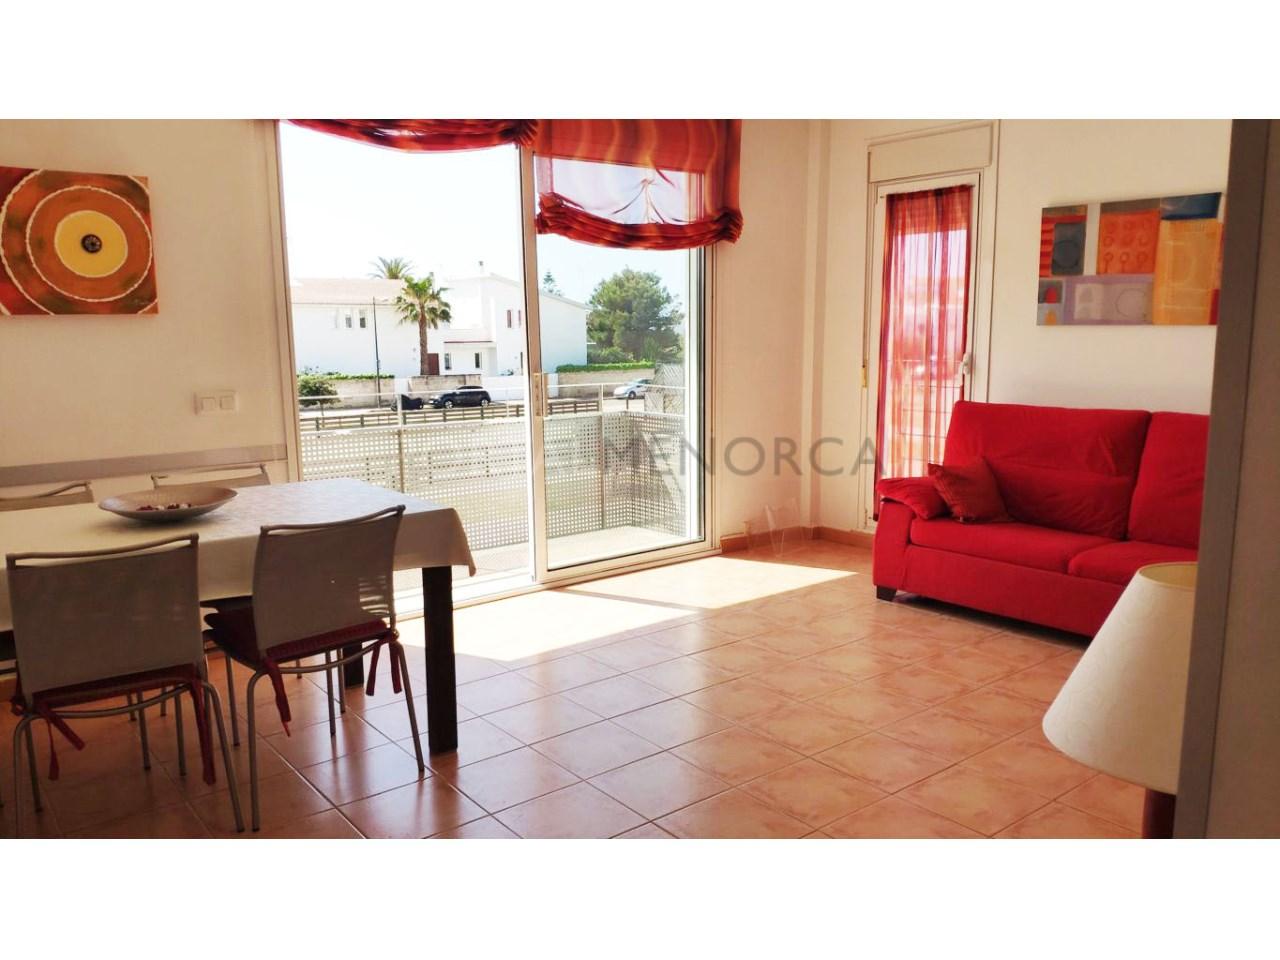 Frist floor apartament for sale in Ciutadella-Living room